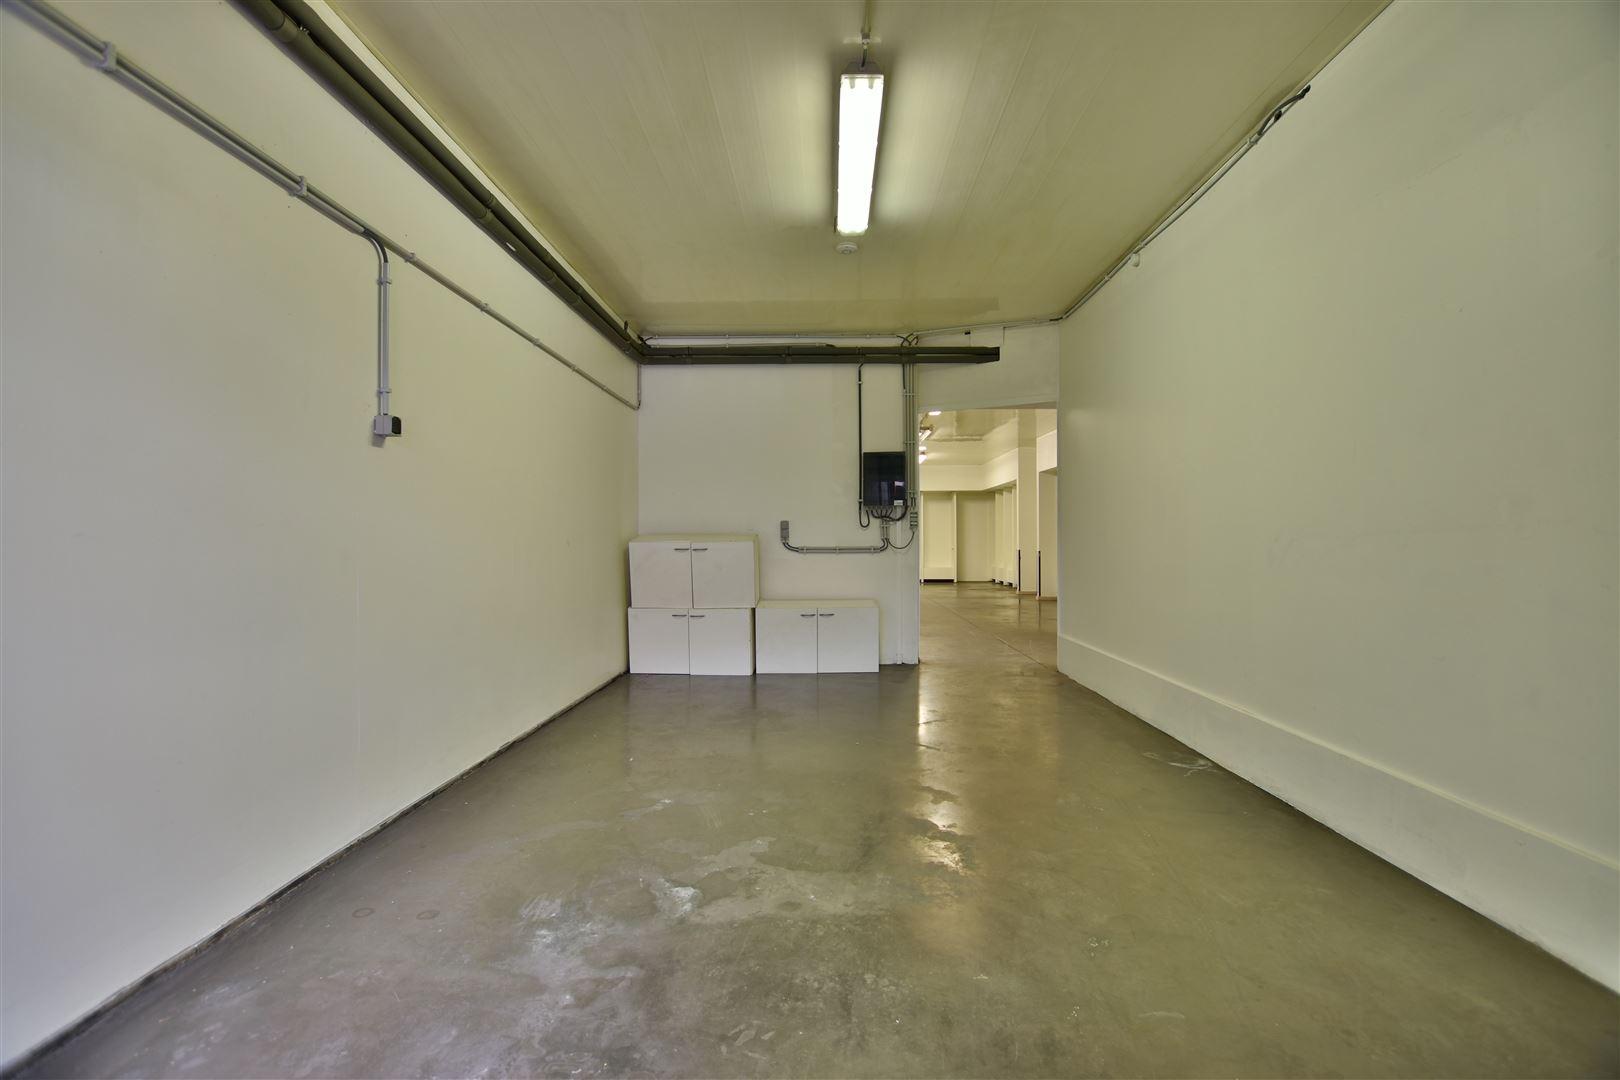 Foto 11 : Kantoorruimte te 9220 HAMME (België) - Prijs € 1.600